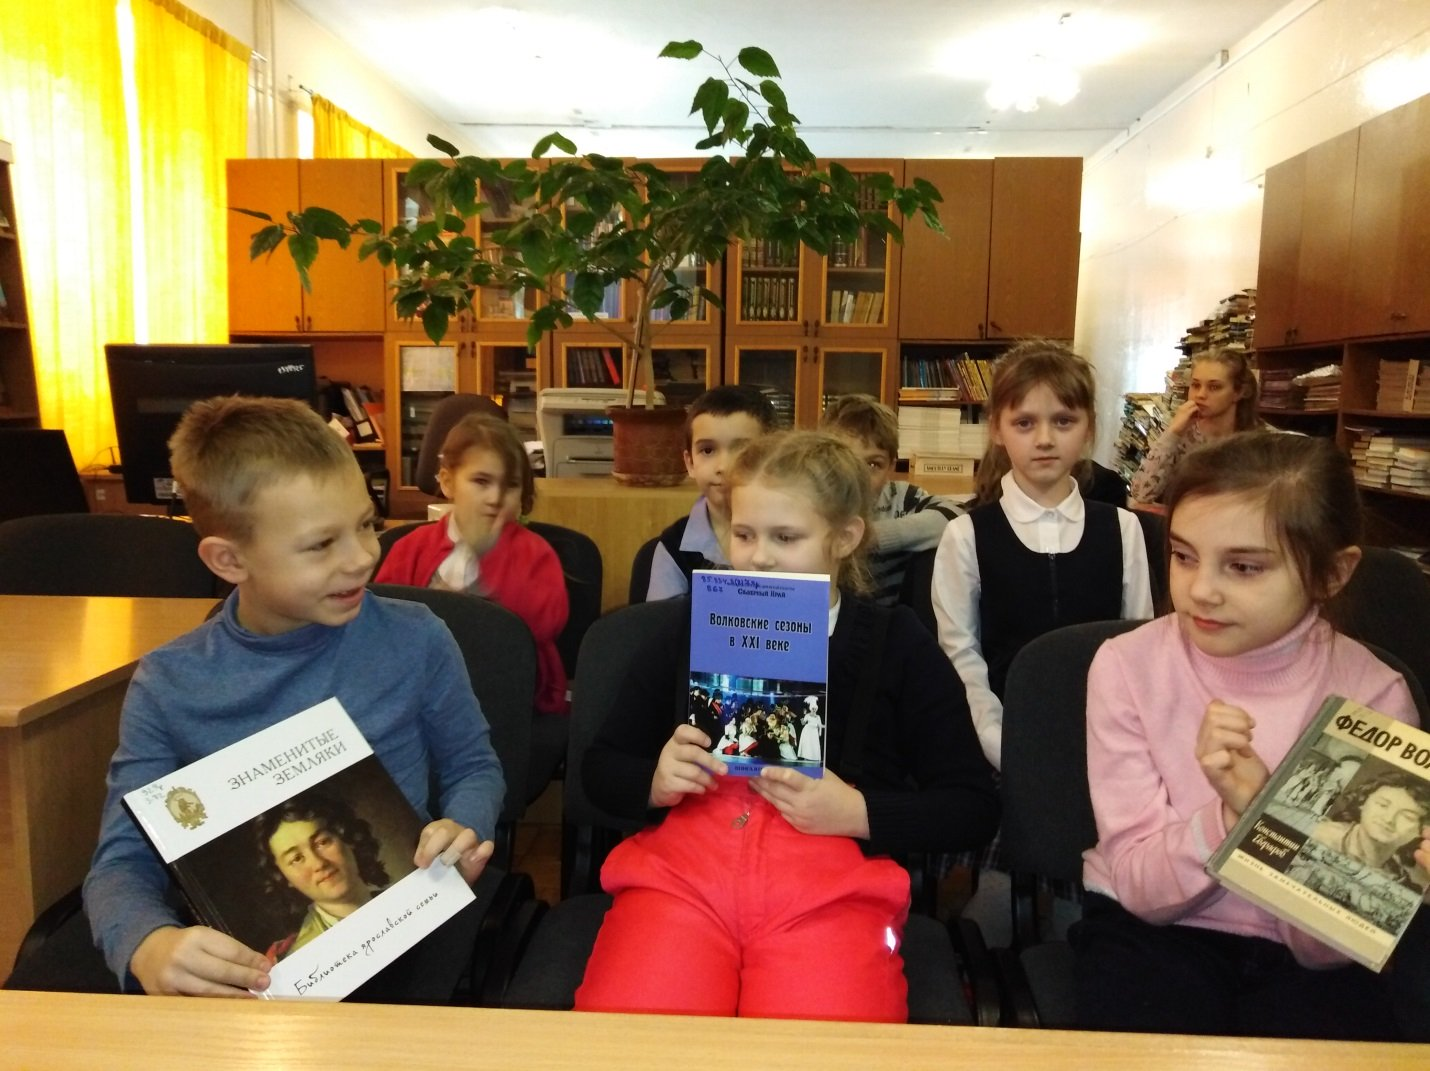 События библиотеки-филиала № 11 имени Г. С. Лебедева в марте 2019 года